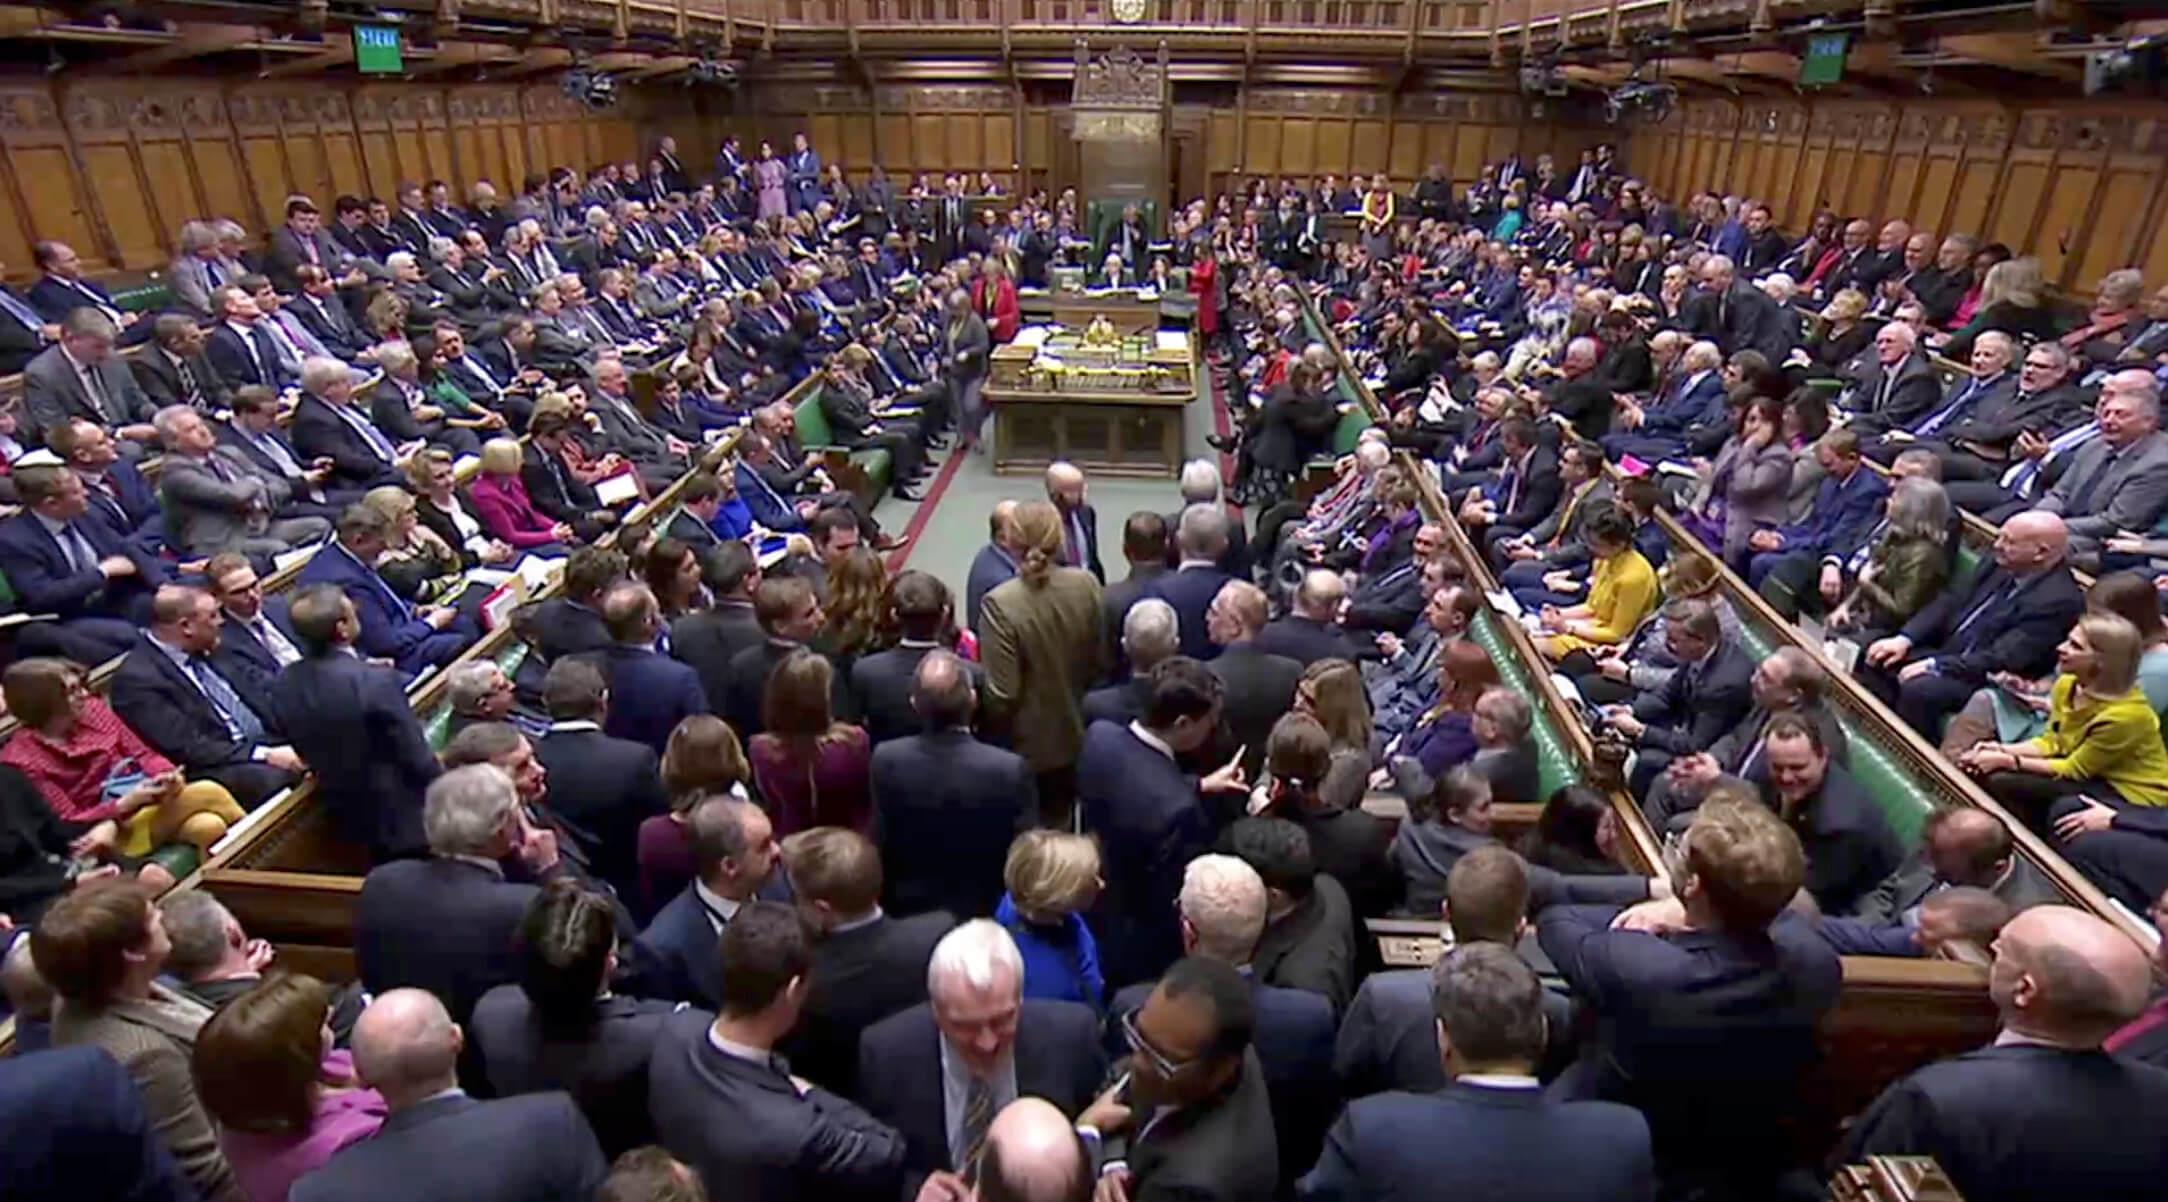 Brexit: Νέα συντριβή για την Μέι - Απορρίφθηκε με μεγάλη διαφορά το σχέδιό της από το Βρετανικό κοινοβούλιο